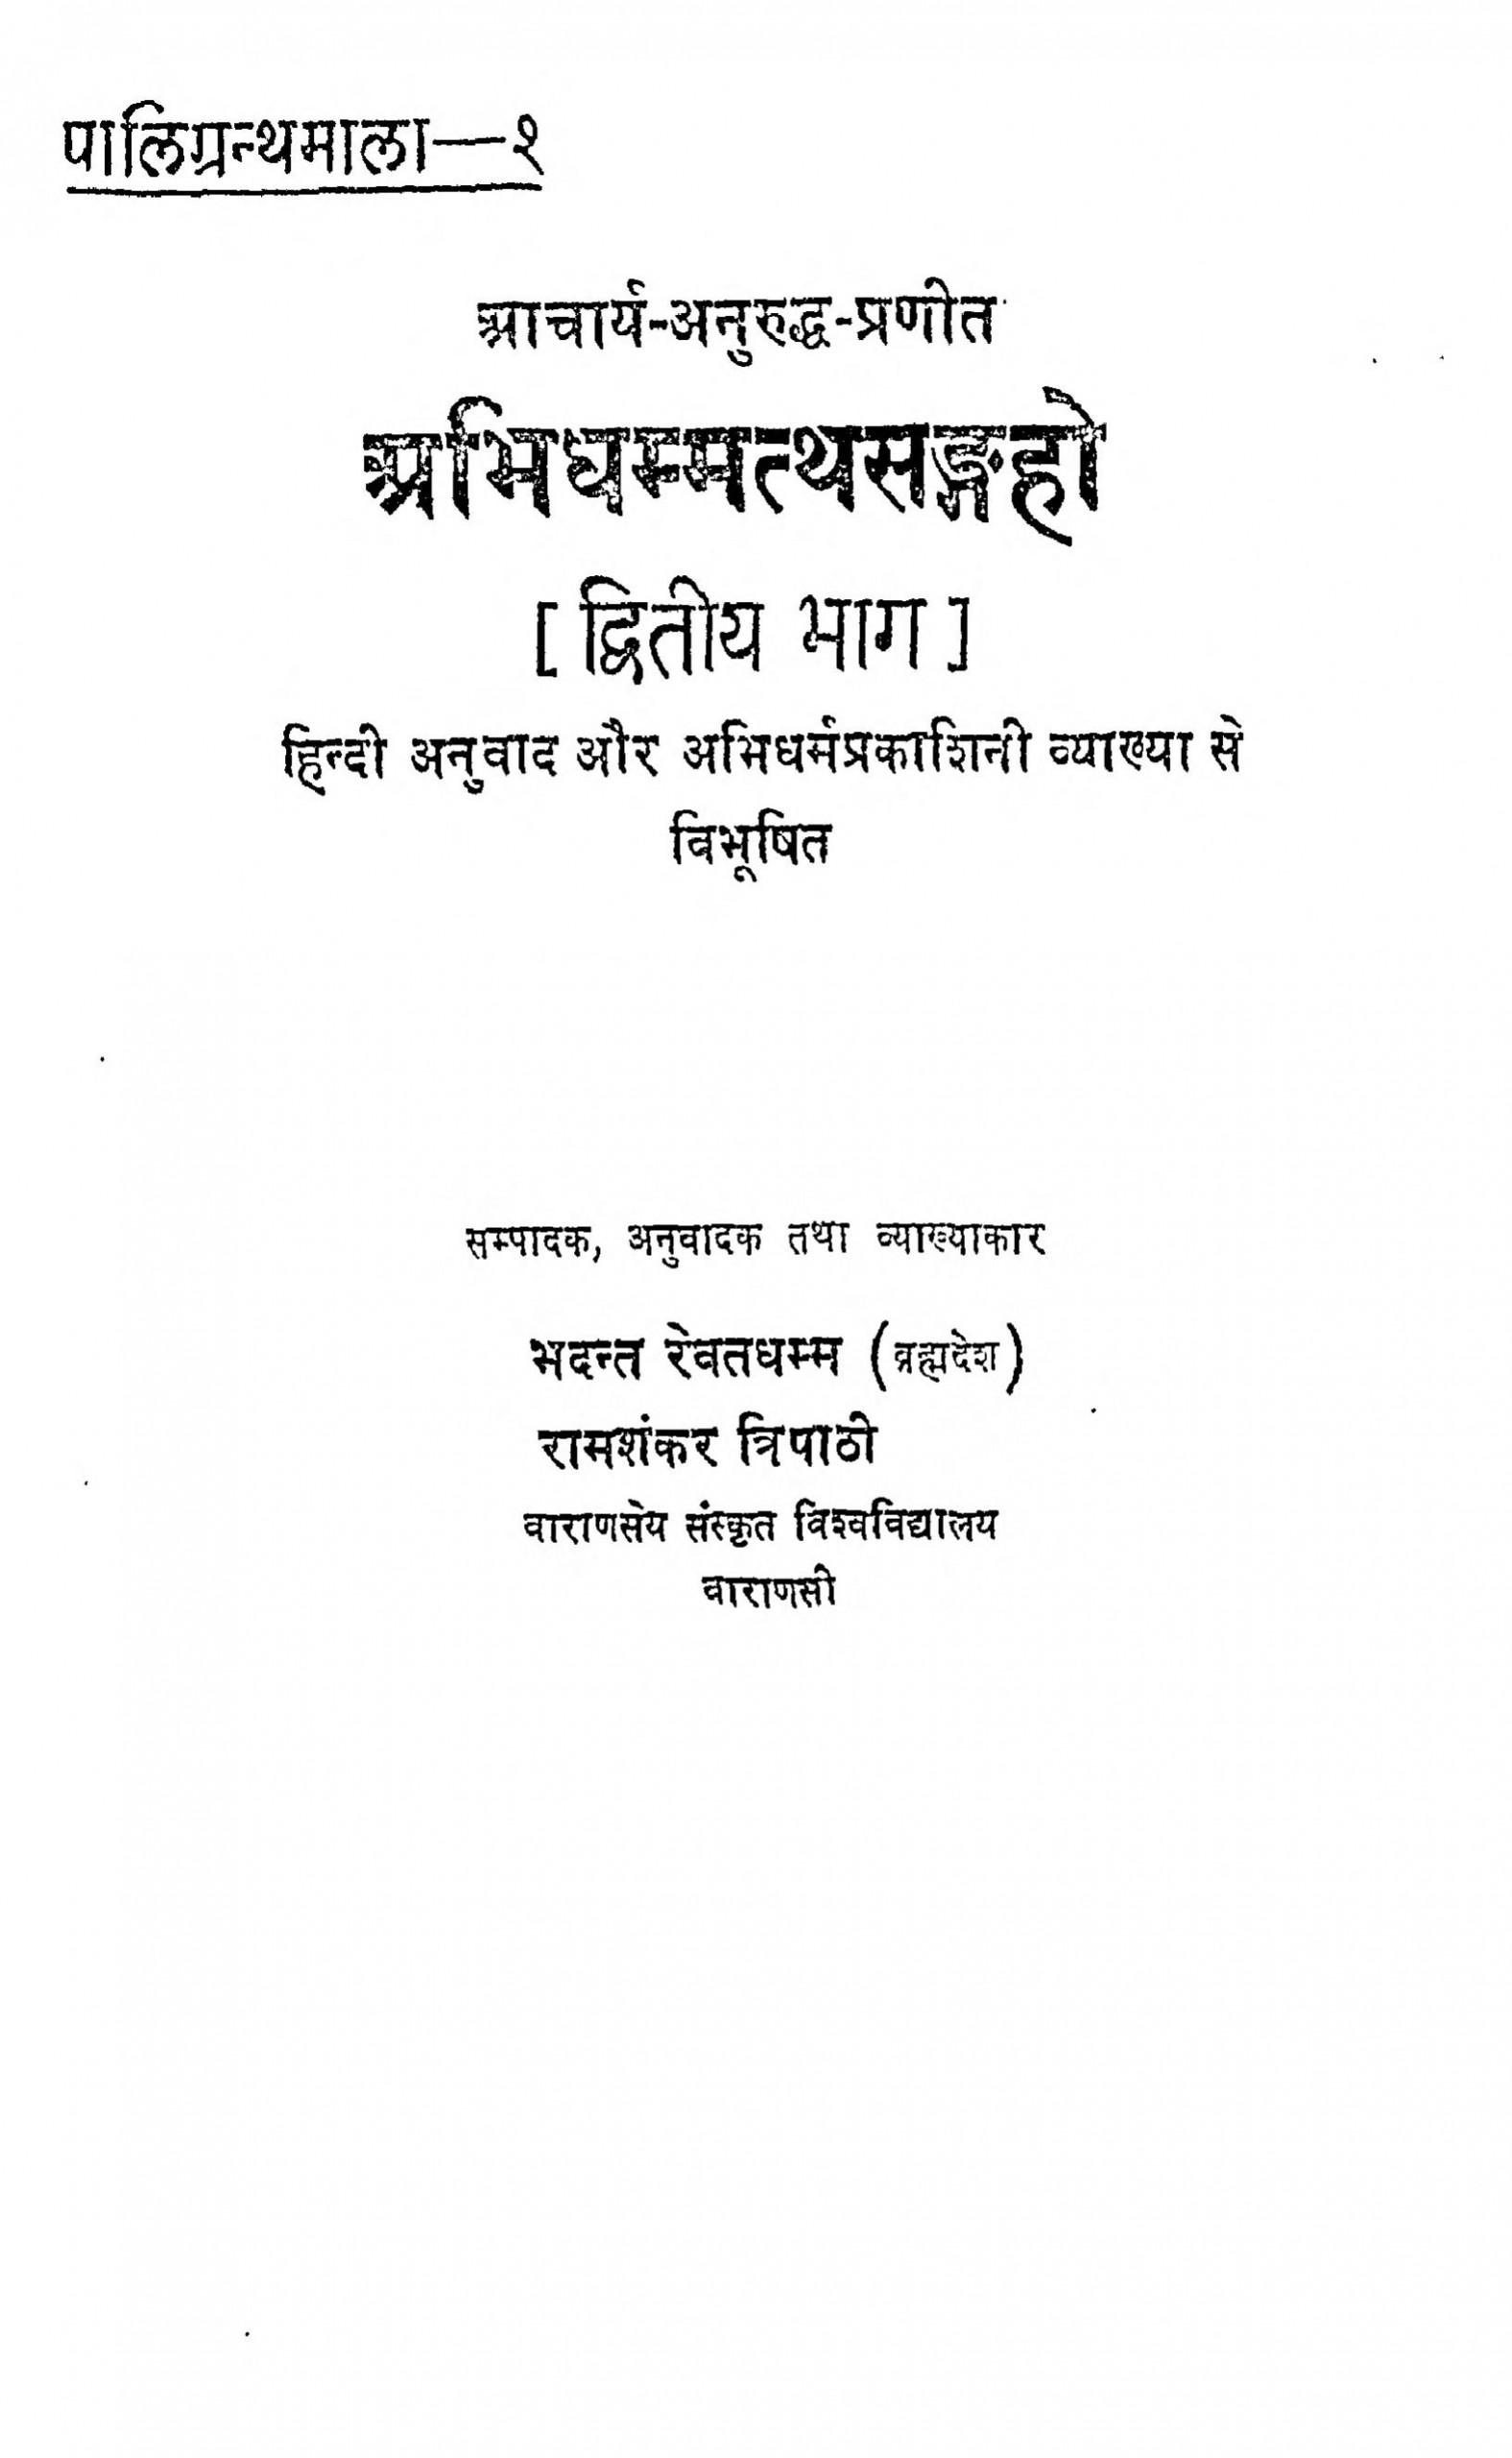 Book Image : अभिधम्मत्थसगहो - Abhidhammatthasangaho